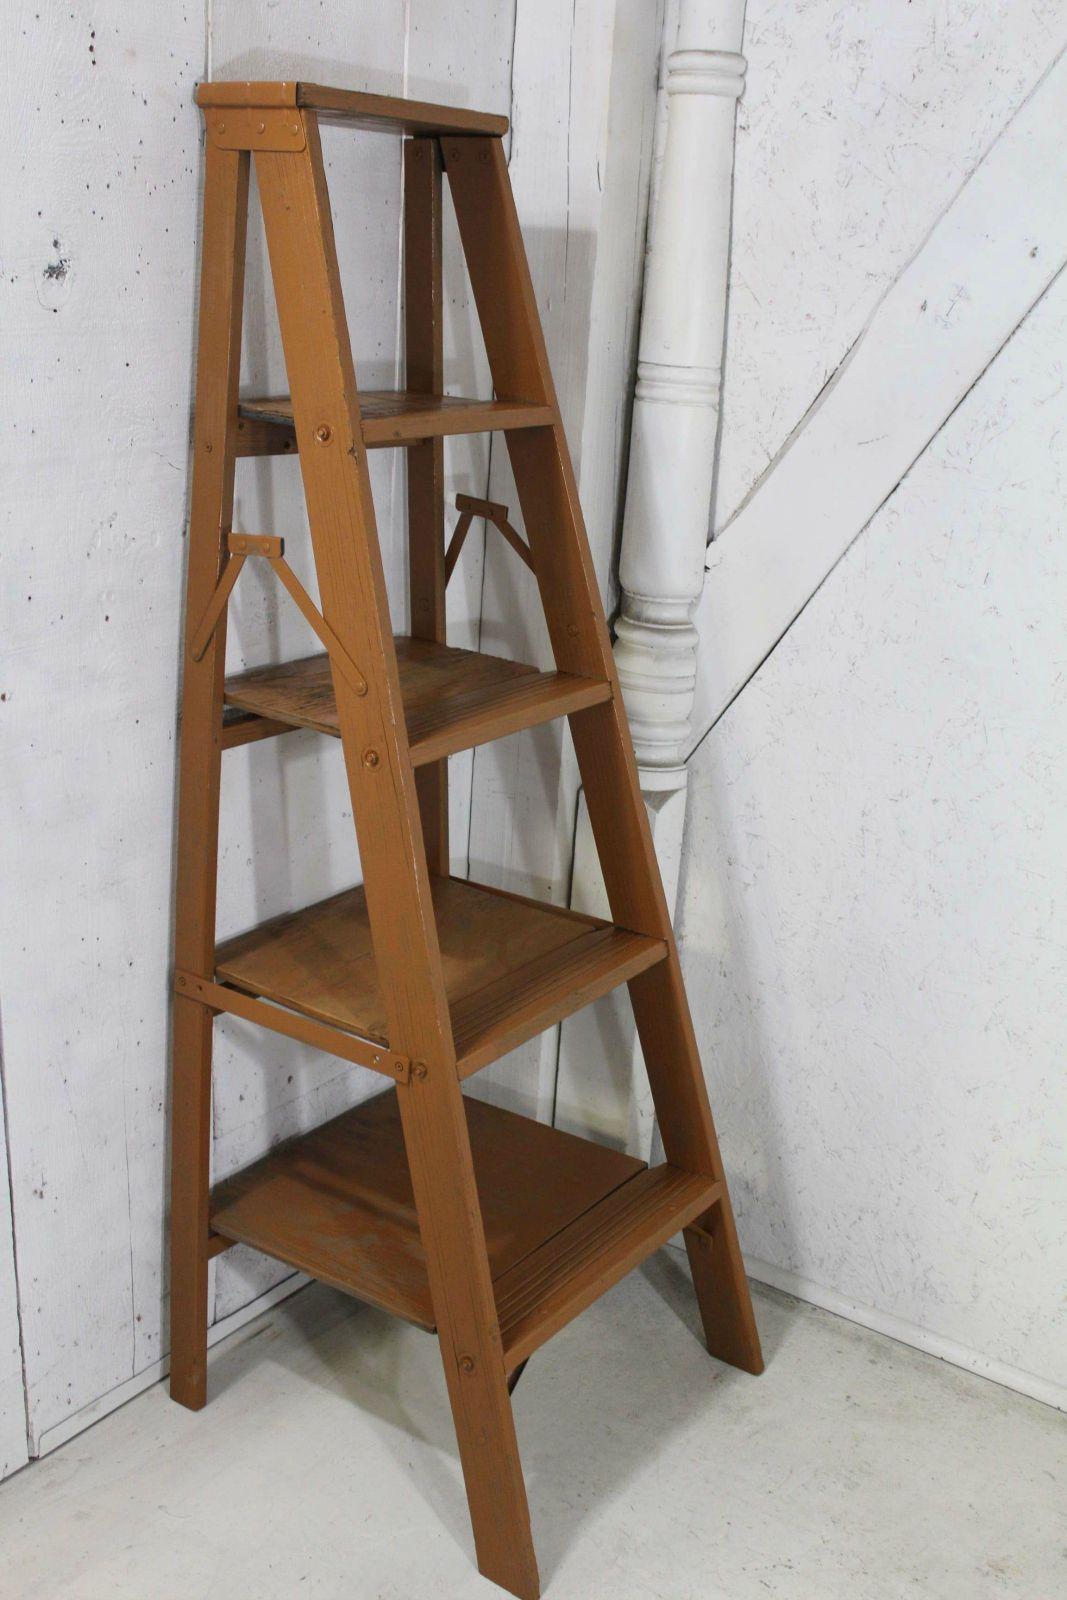 5 Step Wood Vintage Shelf Unit Made From Antique Ladder 56t Wood